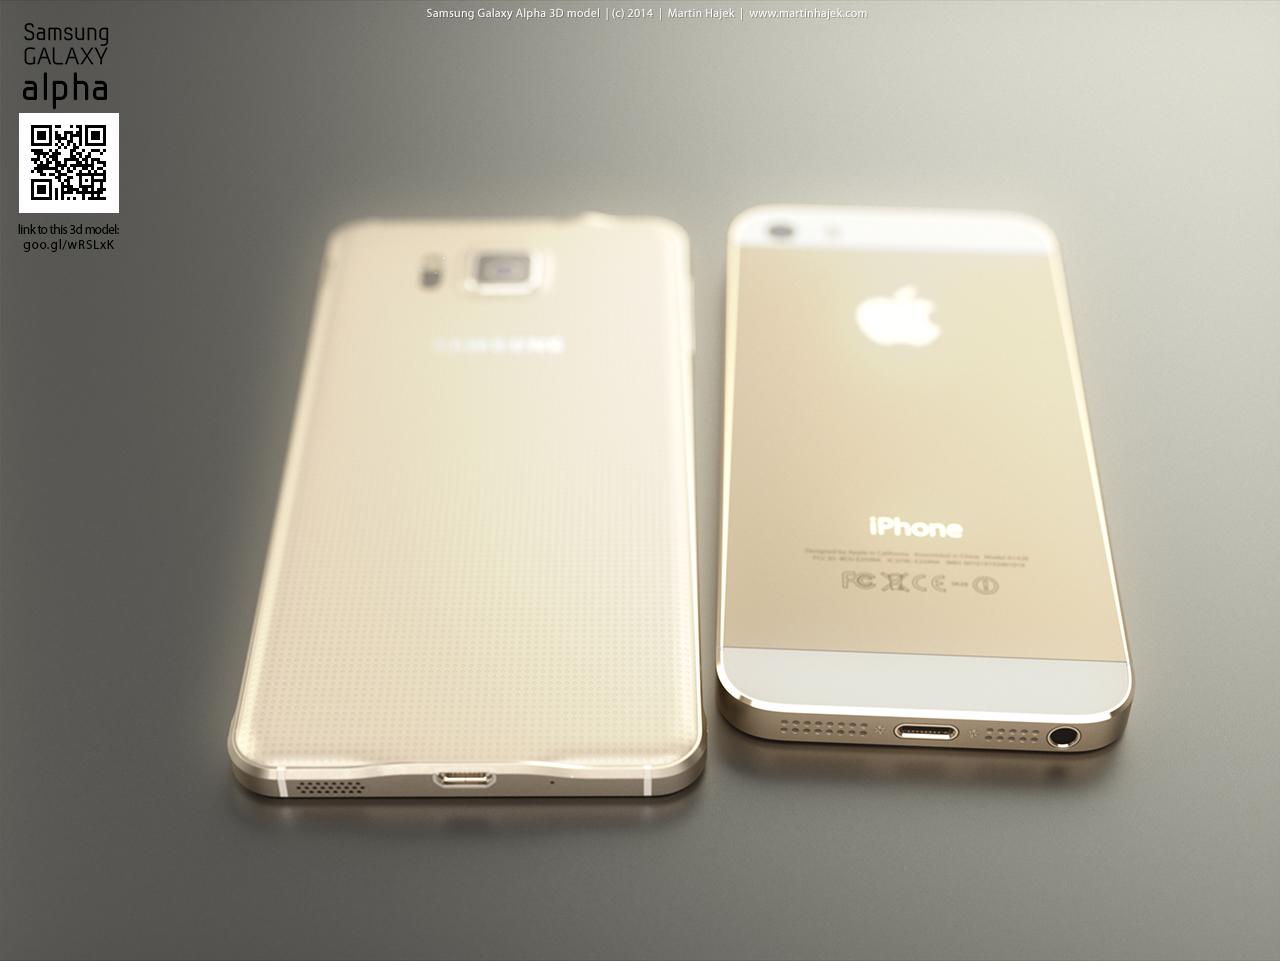 iPhone-5s-vs-Galaxy-Alpha_01